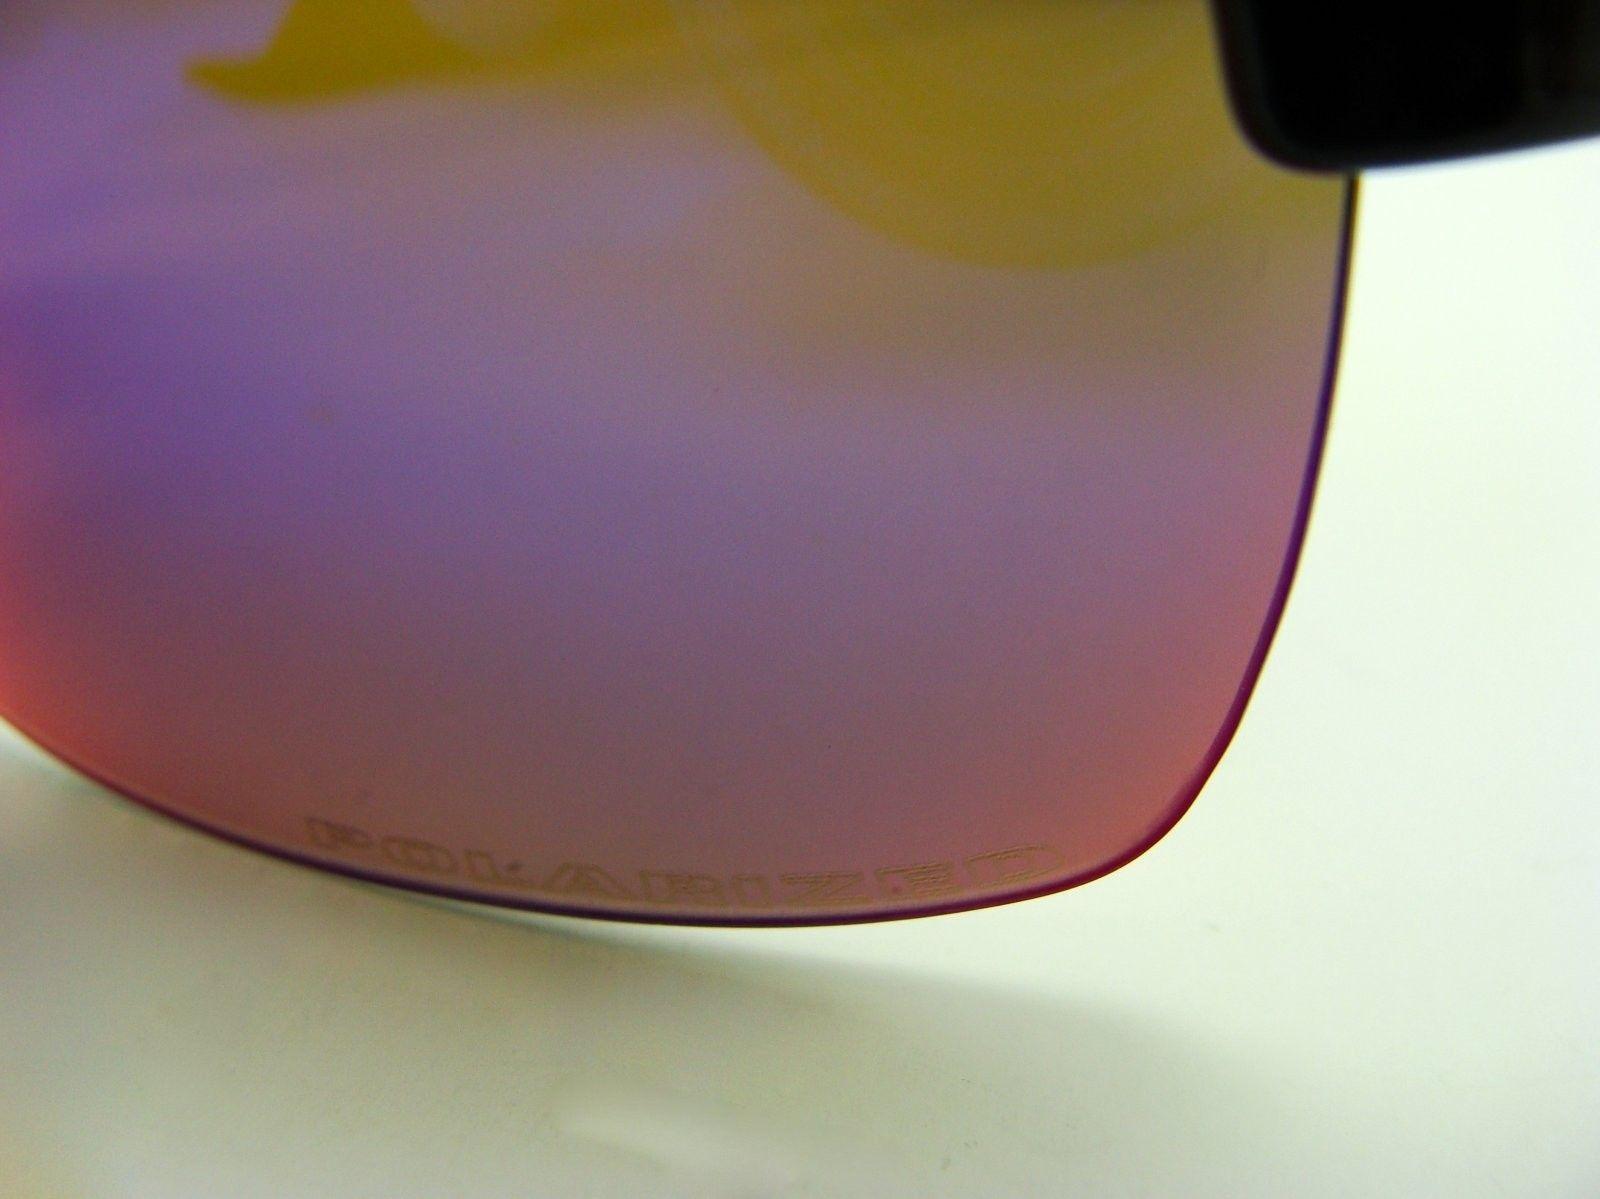 New Polished Carbon/OO Red Ir Polar Carbon Blade For PB1 LNIB/BNIB - OO Red Carbon Blade6.jpg